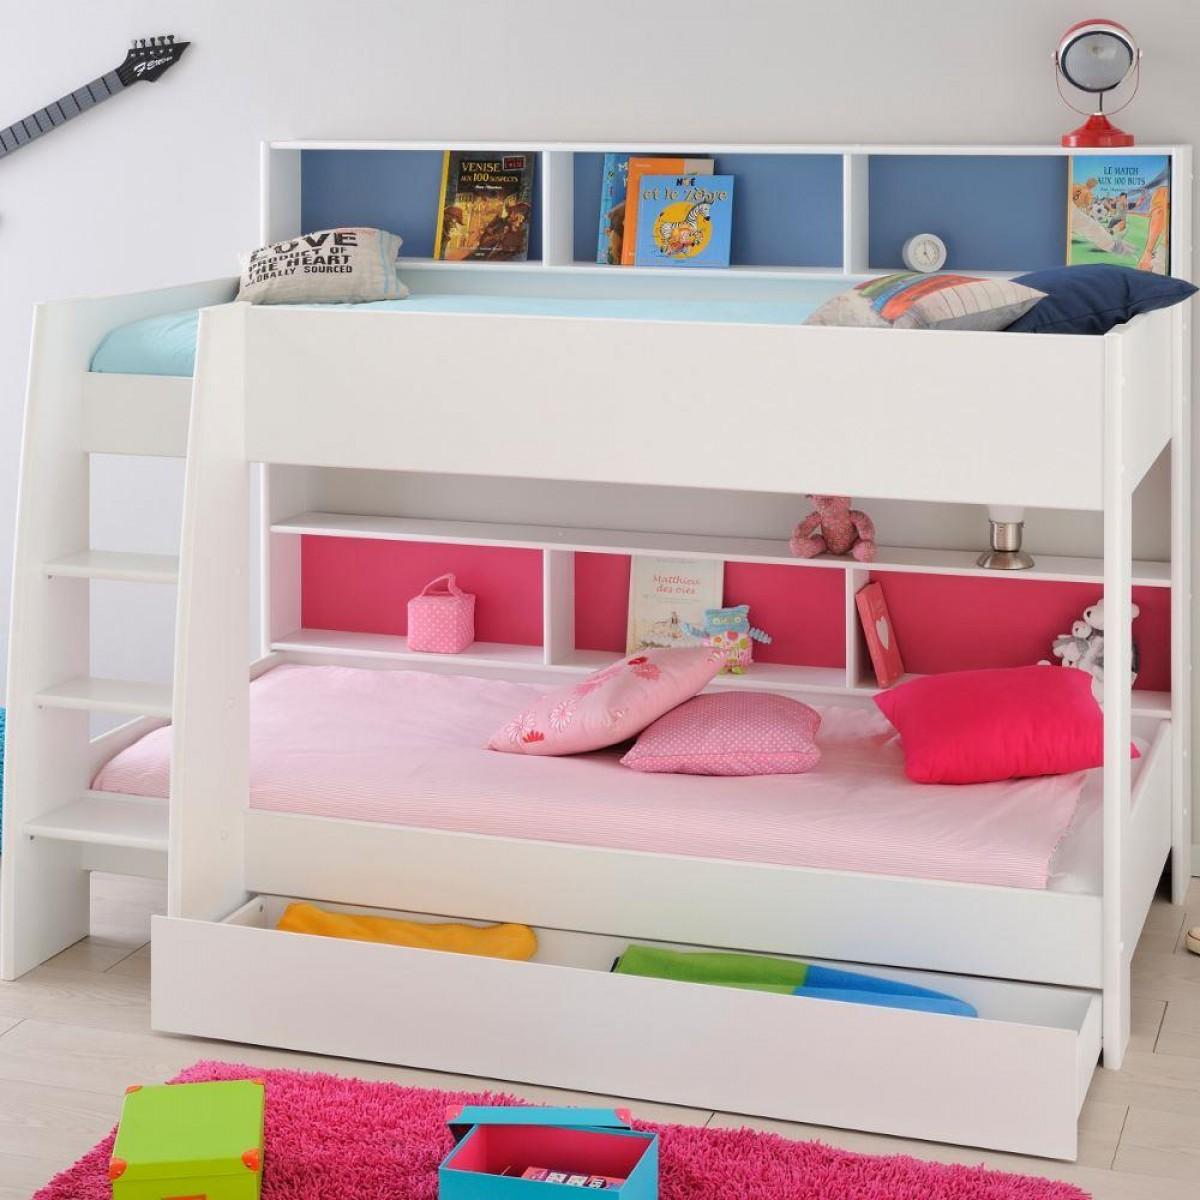 Tam Tam White Wooden Bunk Bed with Underbed Storage Drawer